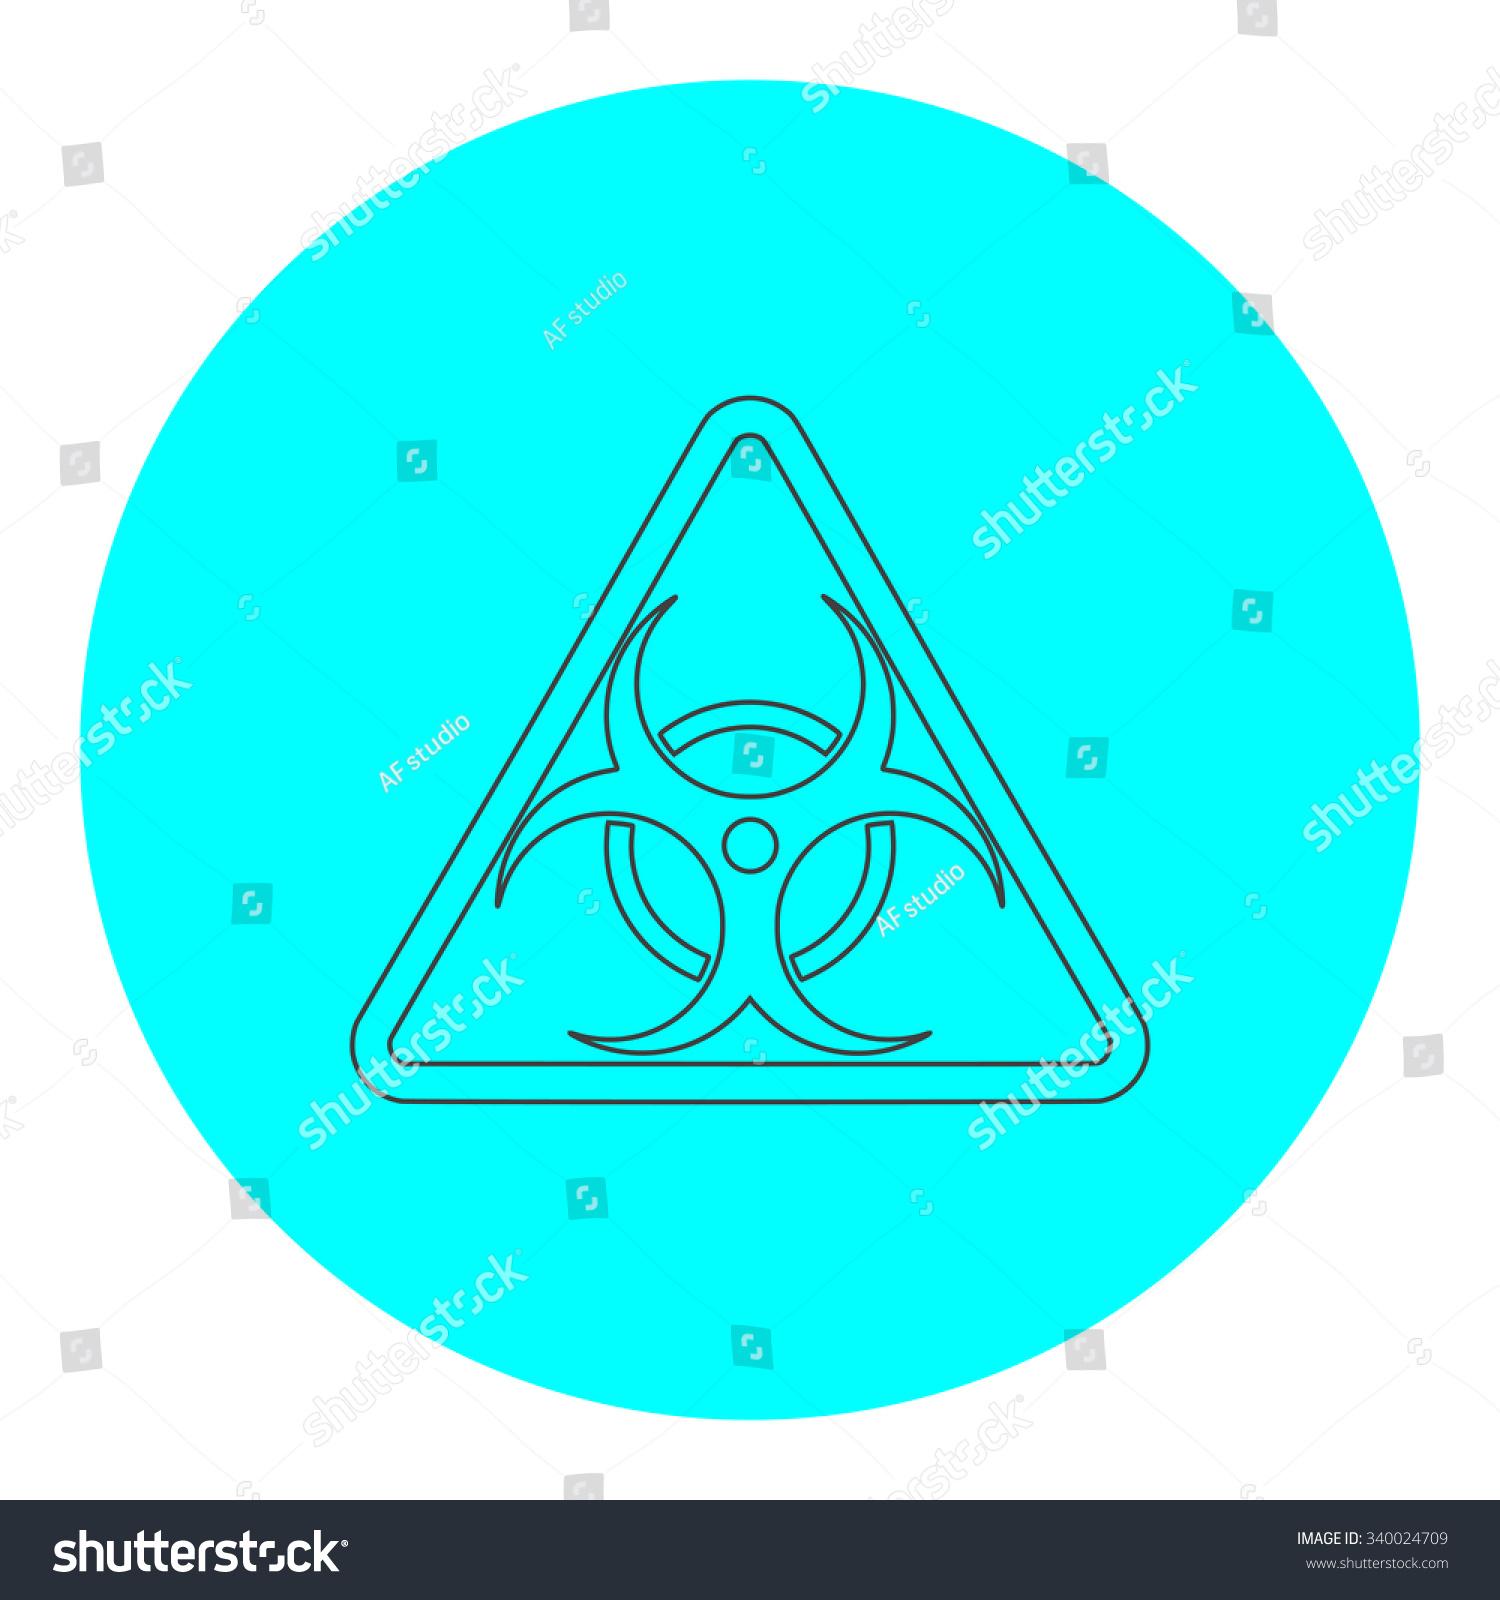 Biohazard Black Outline Flat Symbol On Blue Circle Simple